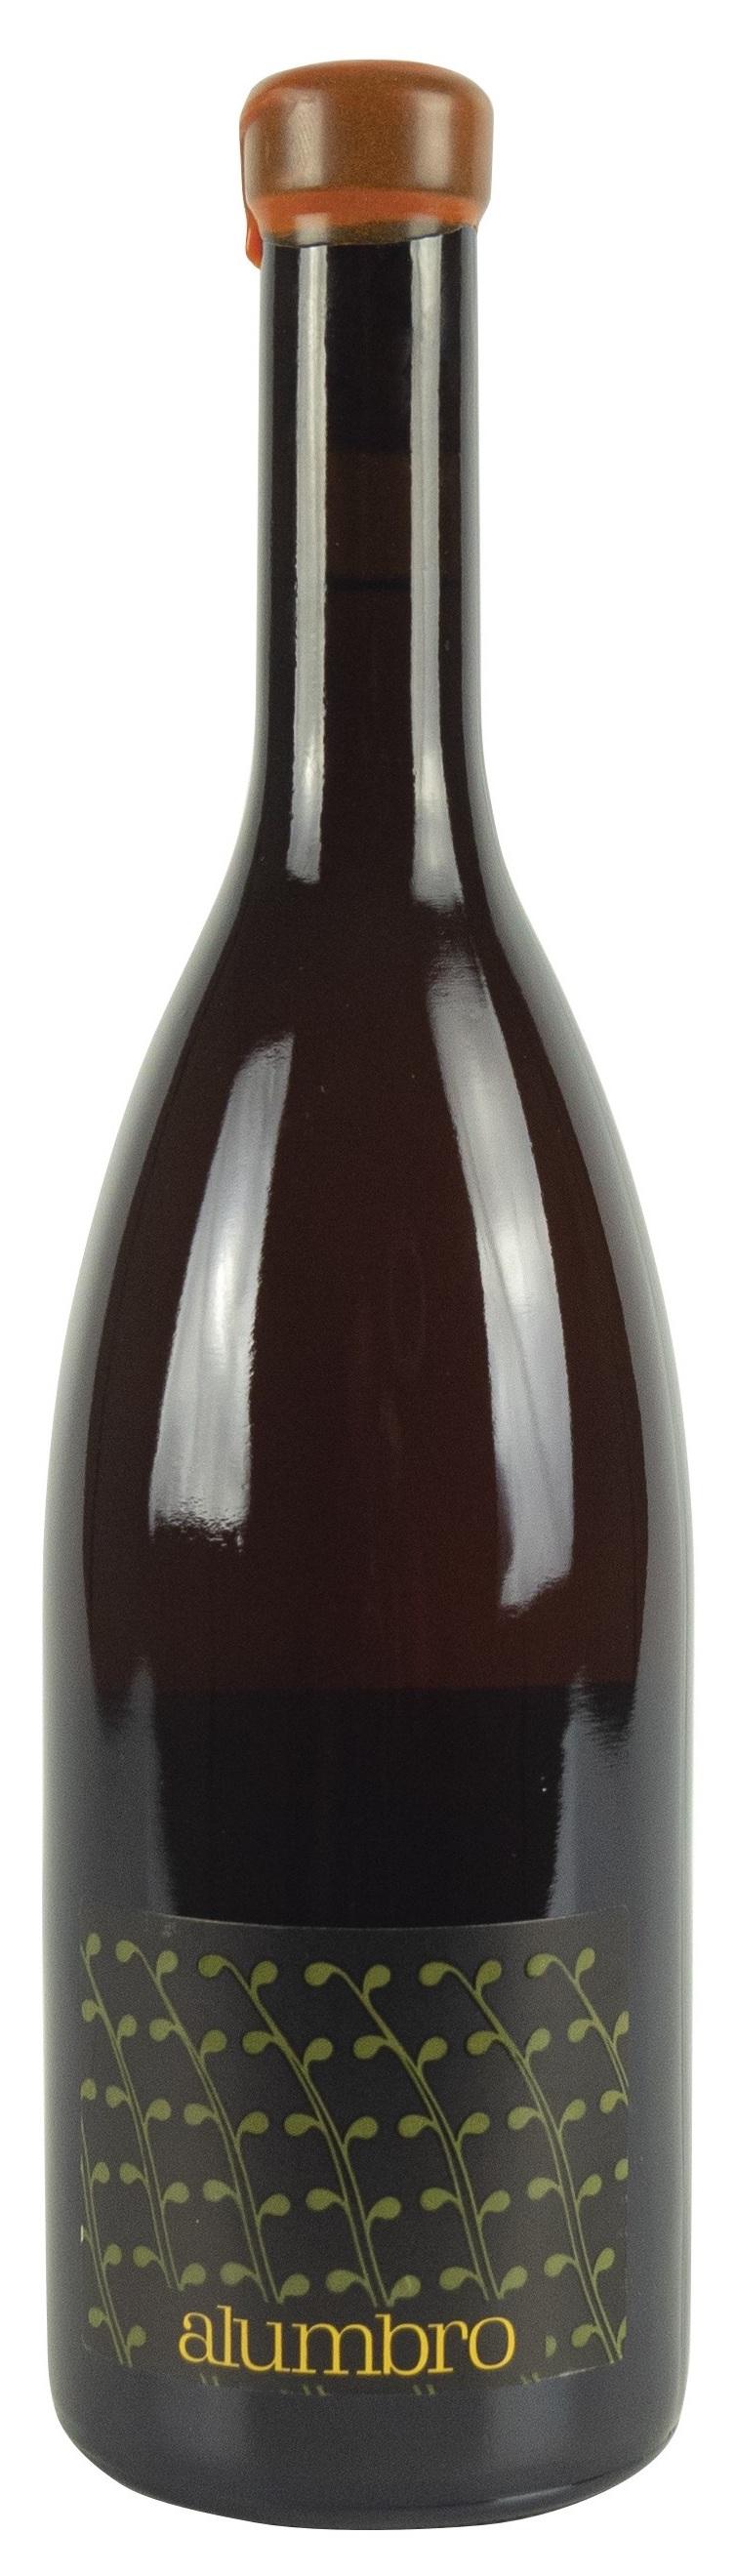 Berretes 16 | Microbodega de Alumbro - Winexfood